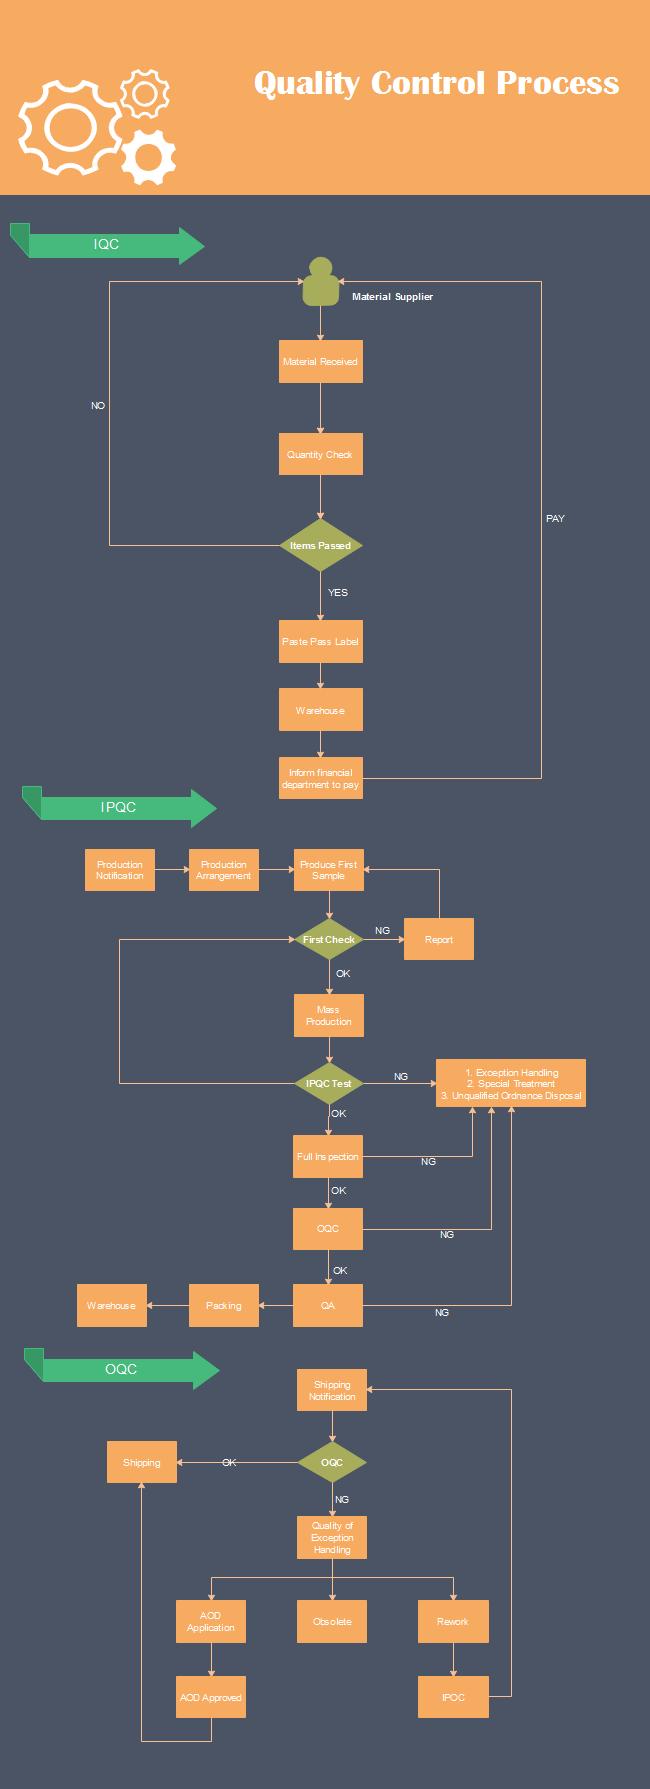 Quality Control Flowchart | warehouse | Flow chart design